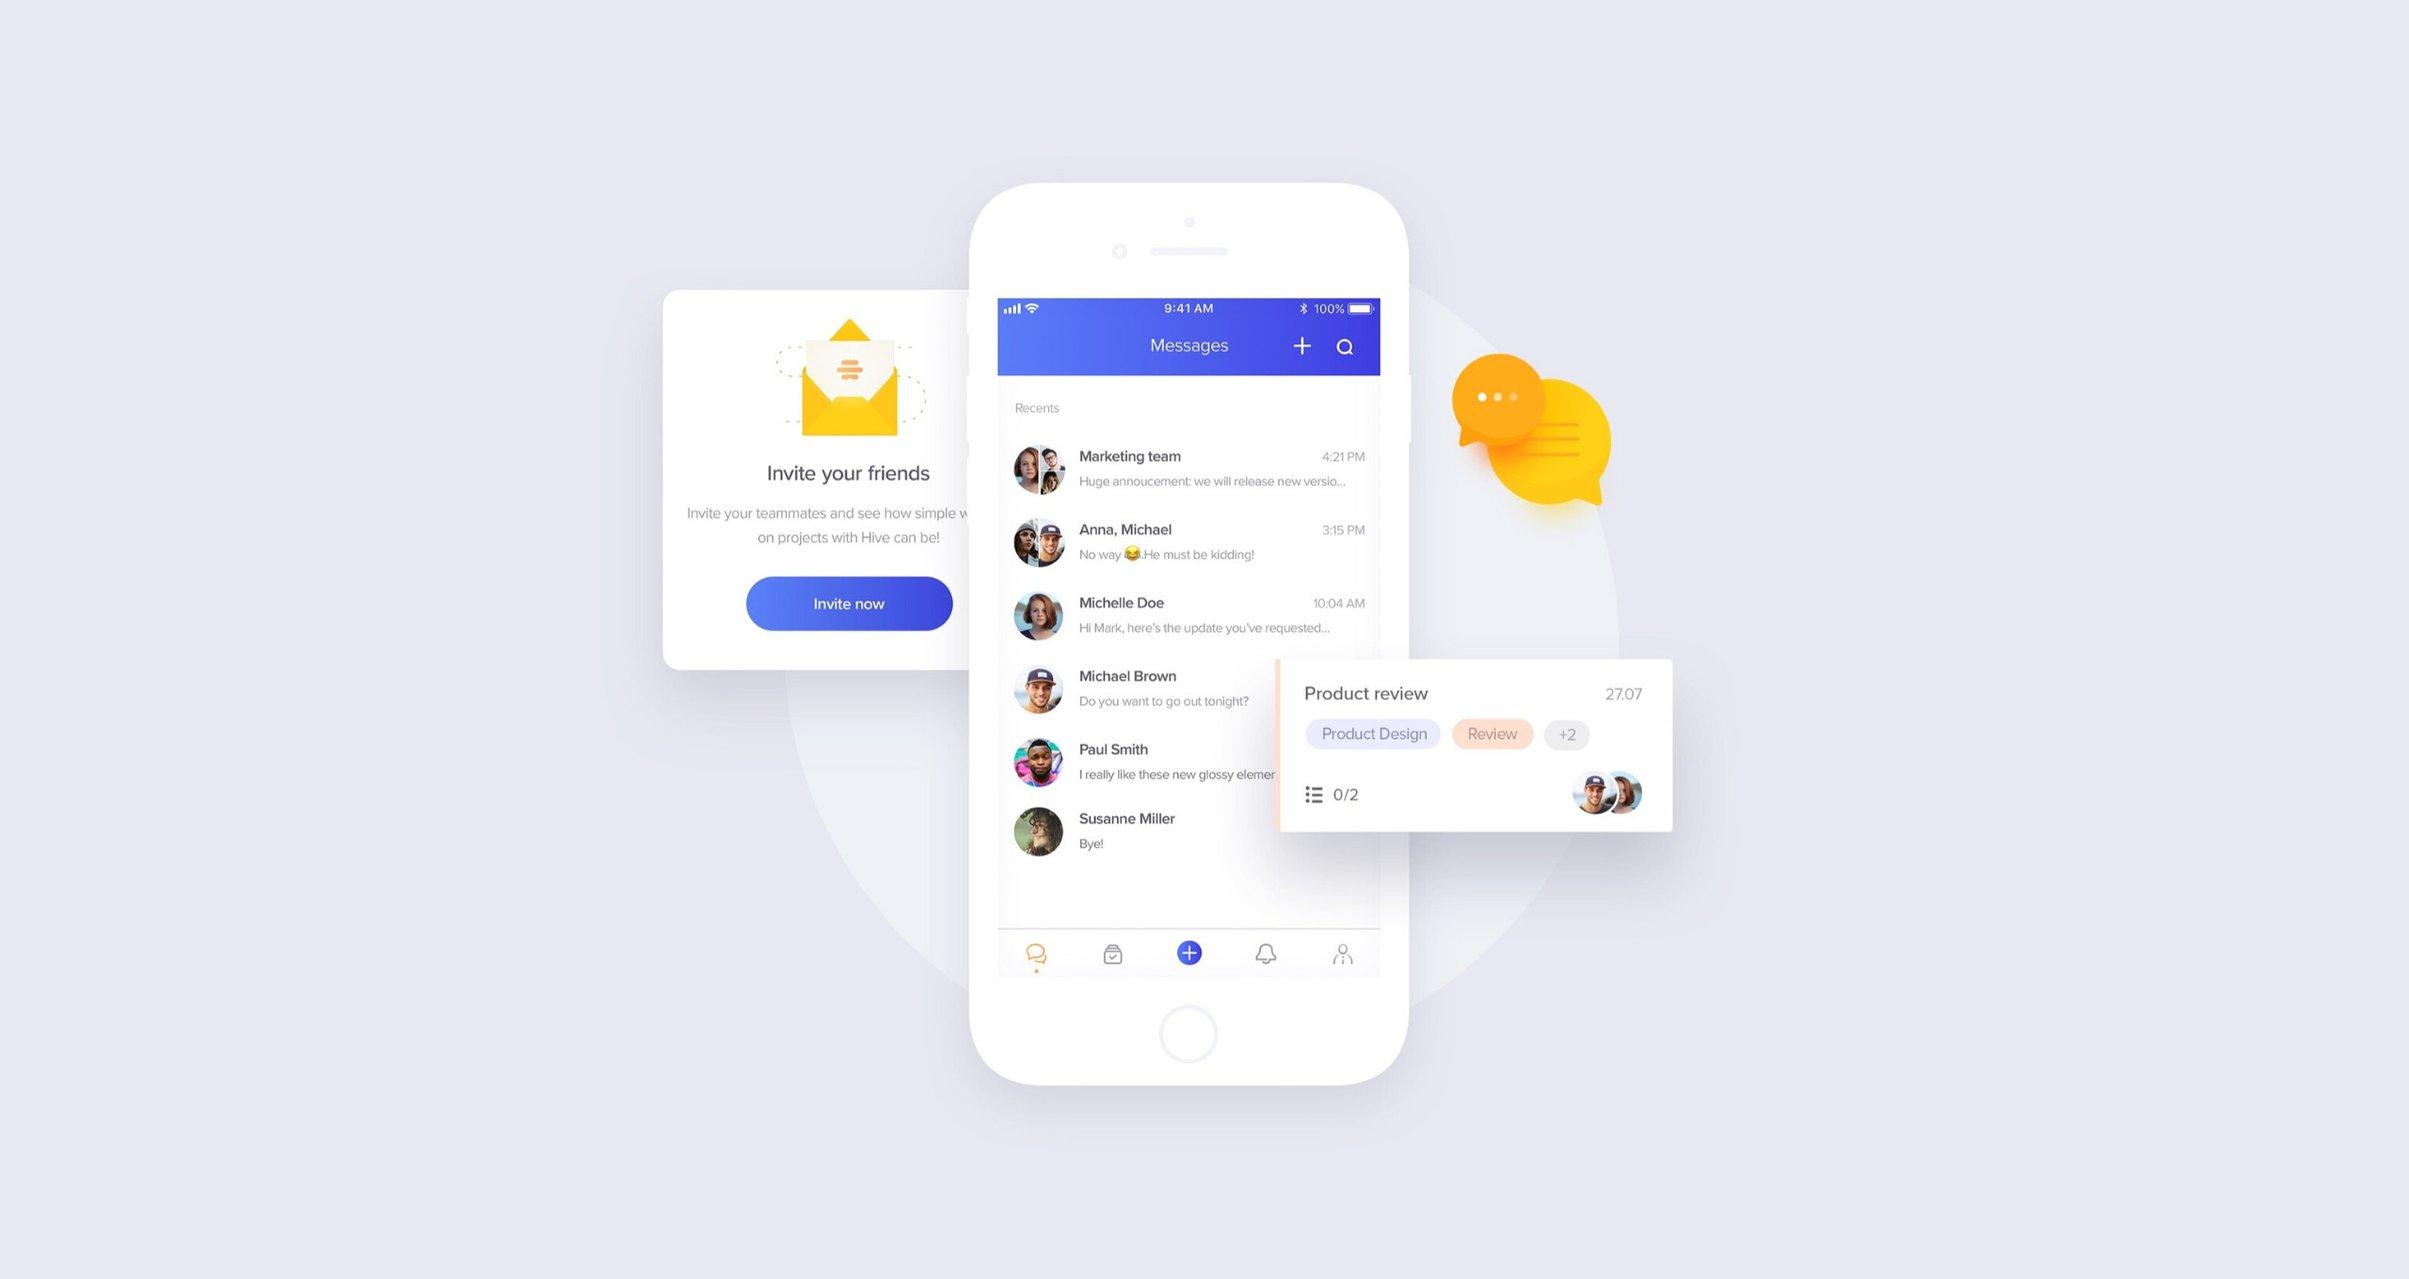 Hive - React Native app developed by Netguru company